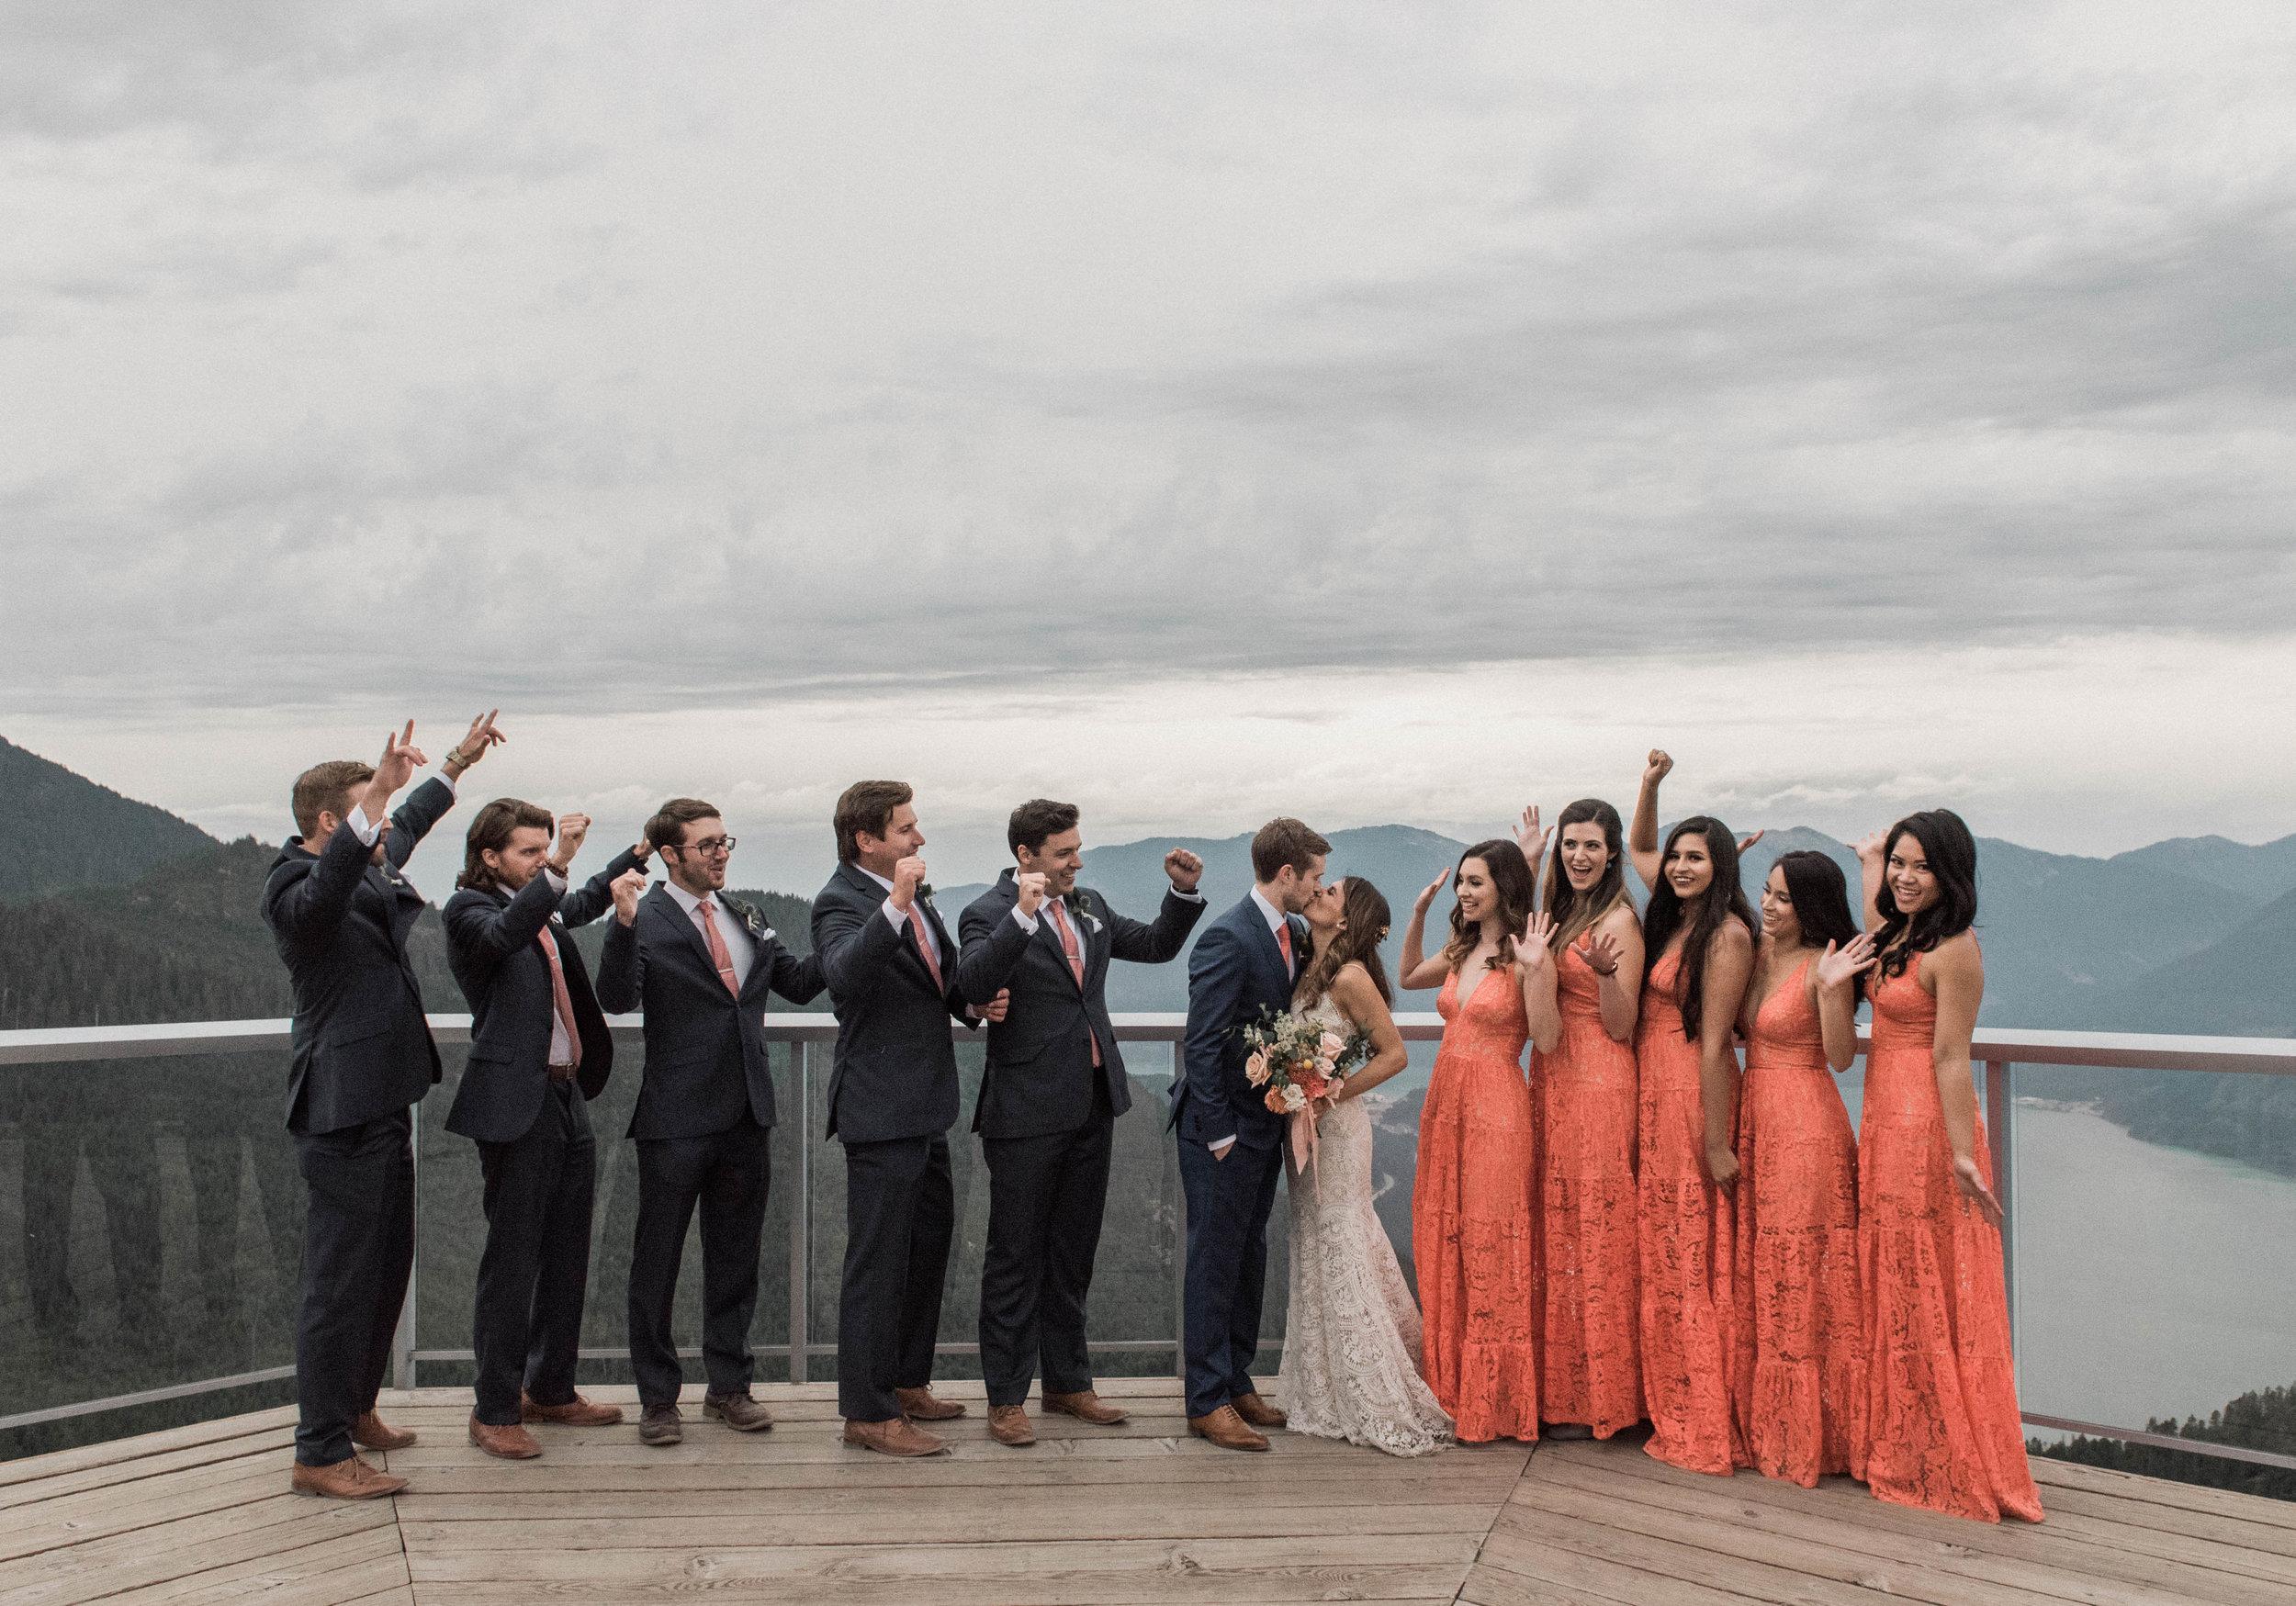 austin-texas-wedding-photography-1778-photographie-98.jpg